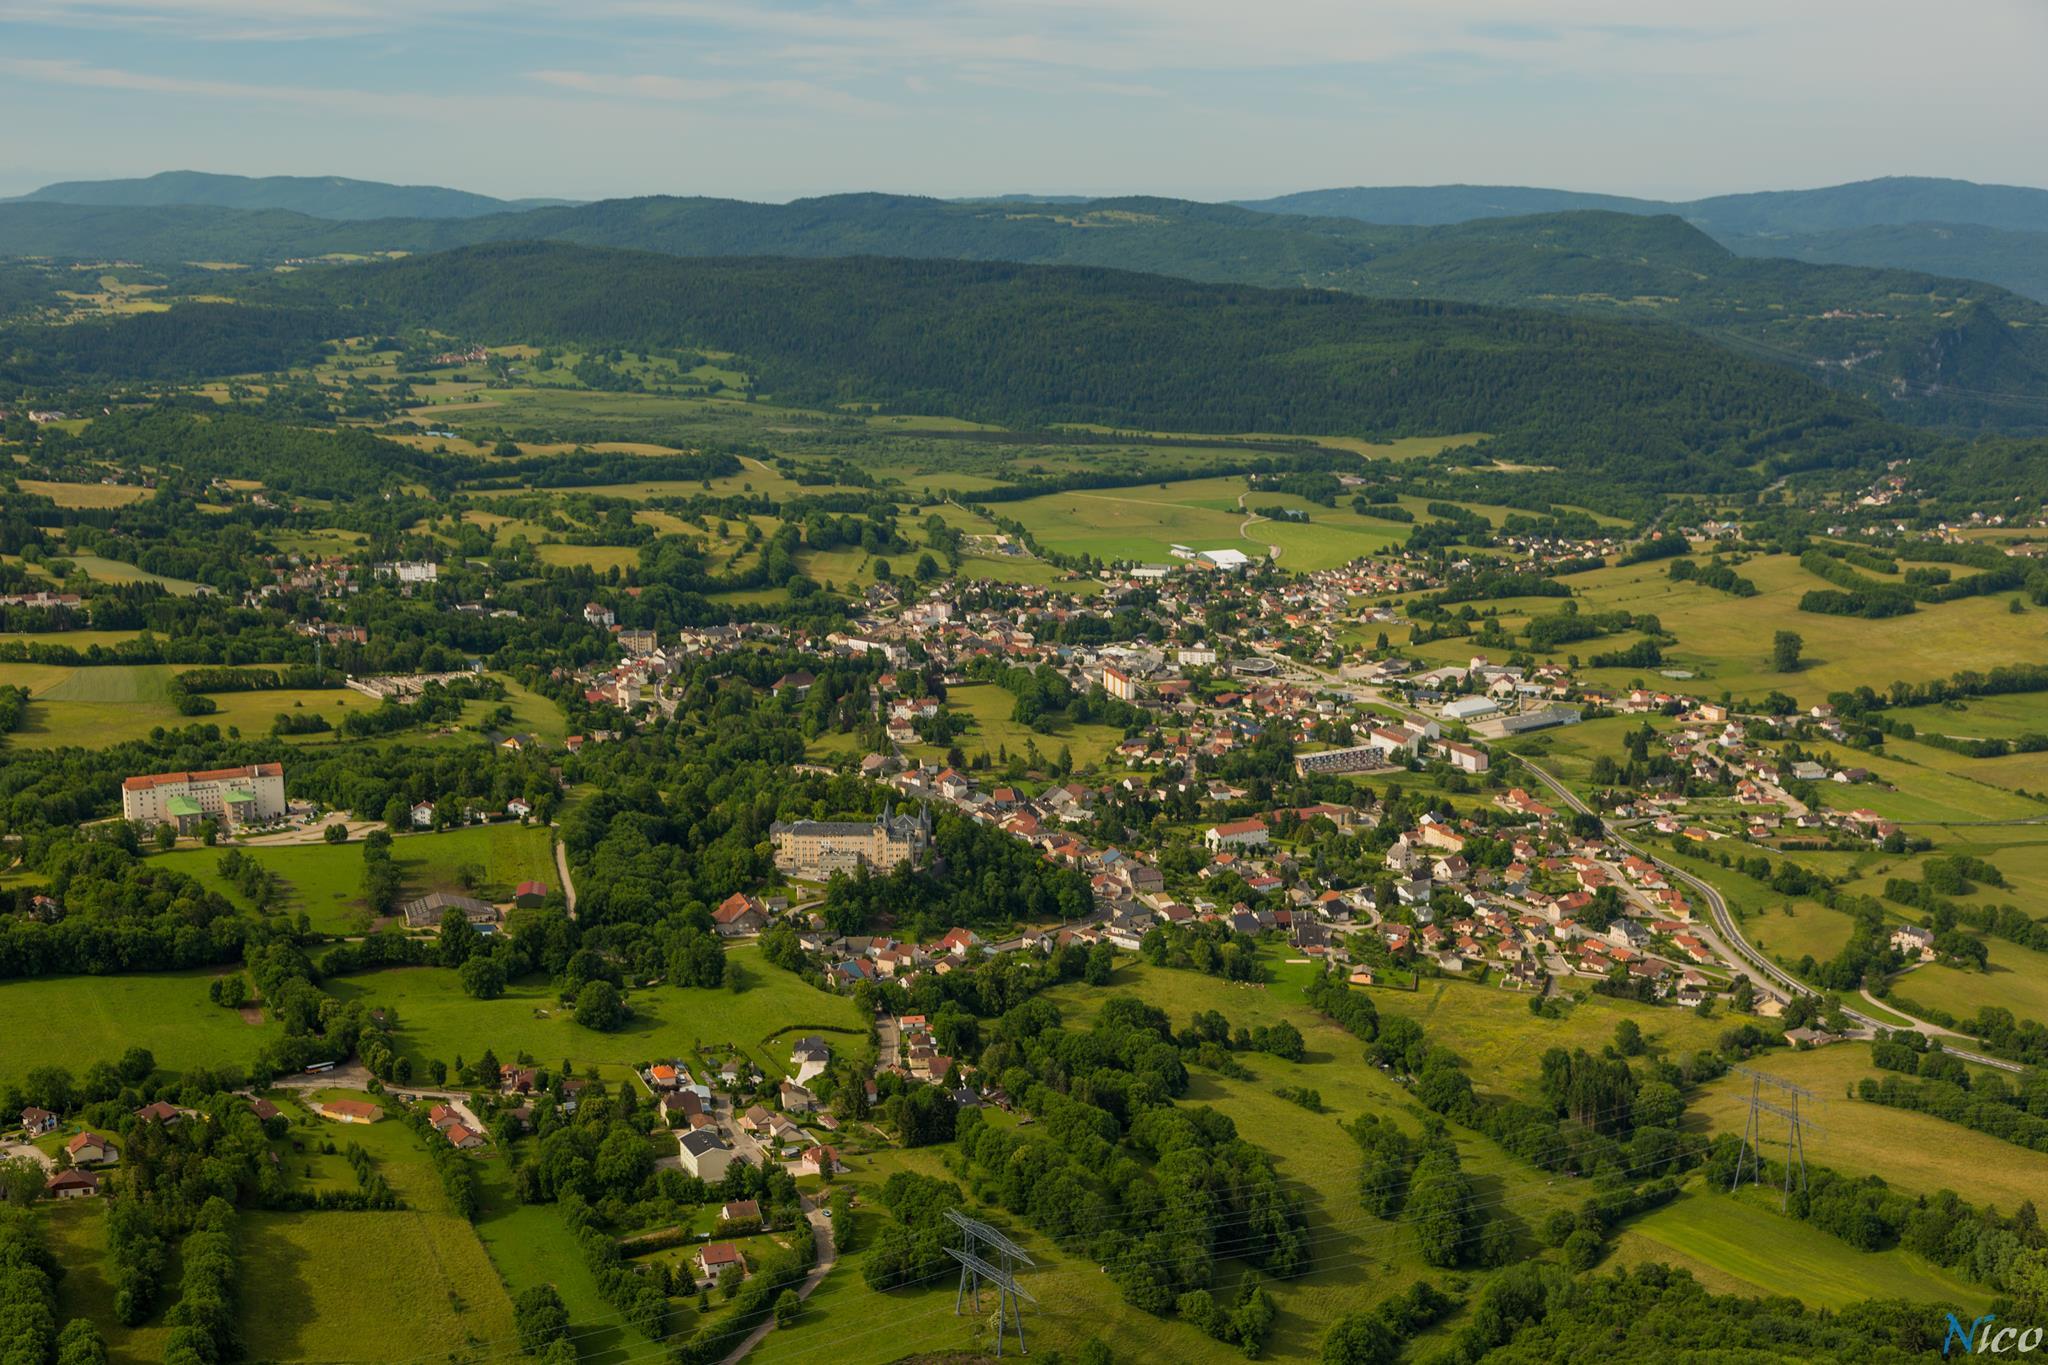 Hauteville-Lompnes